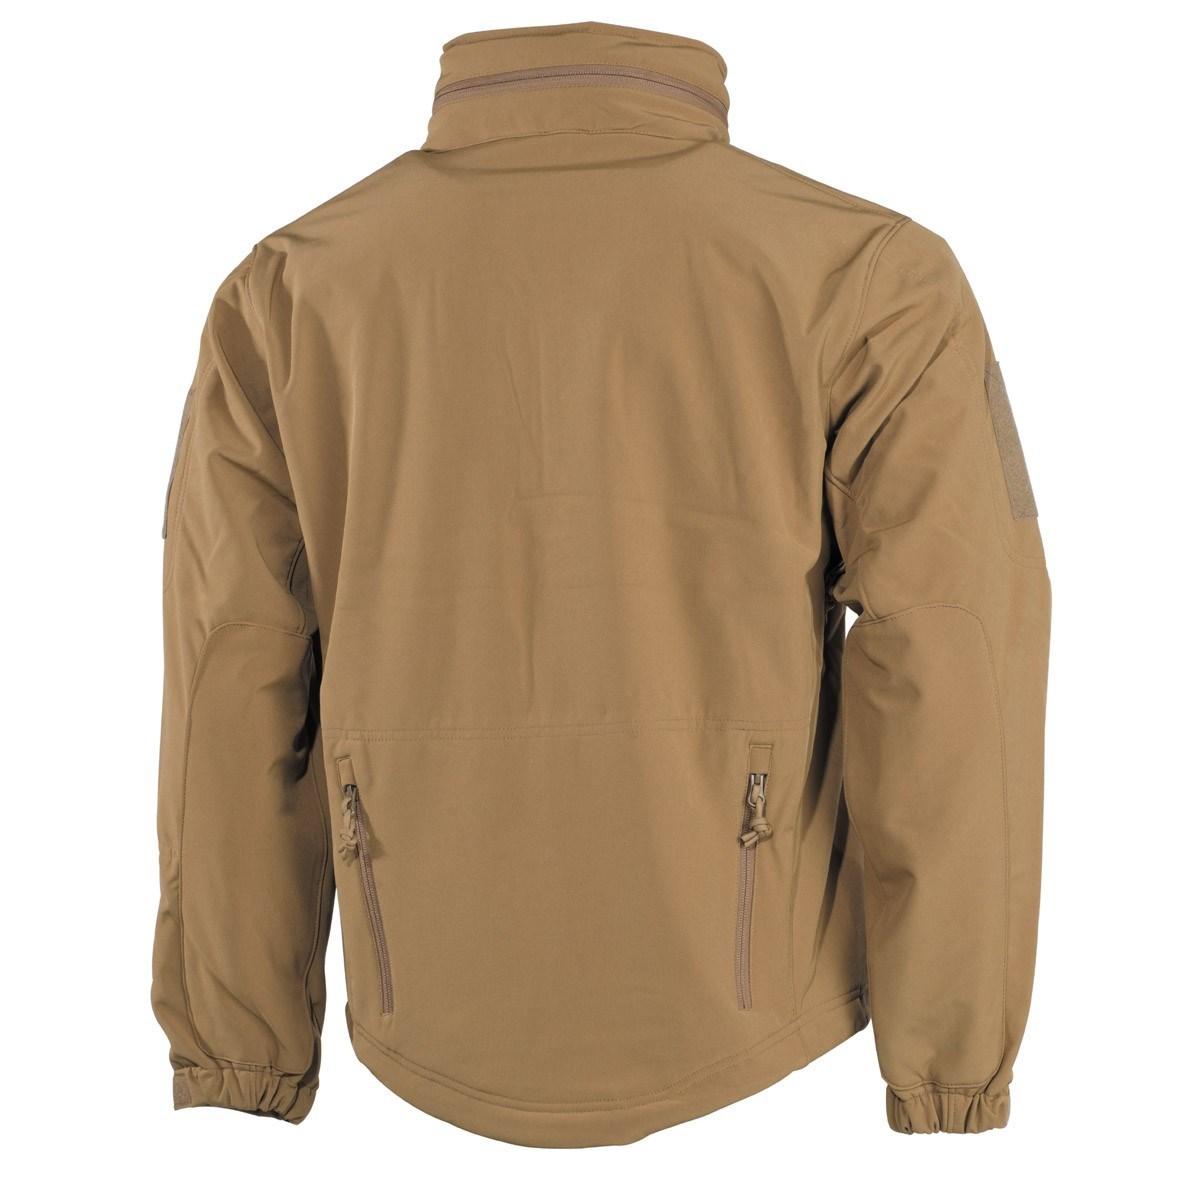 Bunda SCORPION softshellová COYOTE MFH Defence 03415R L-11